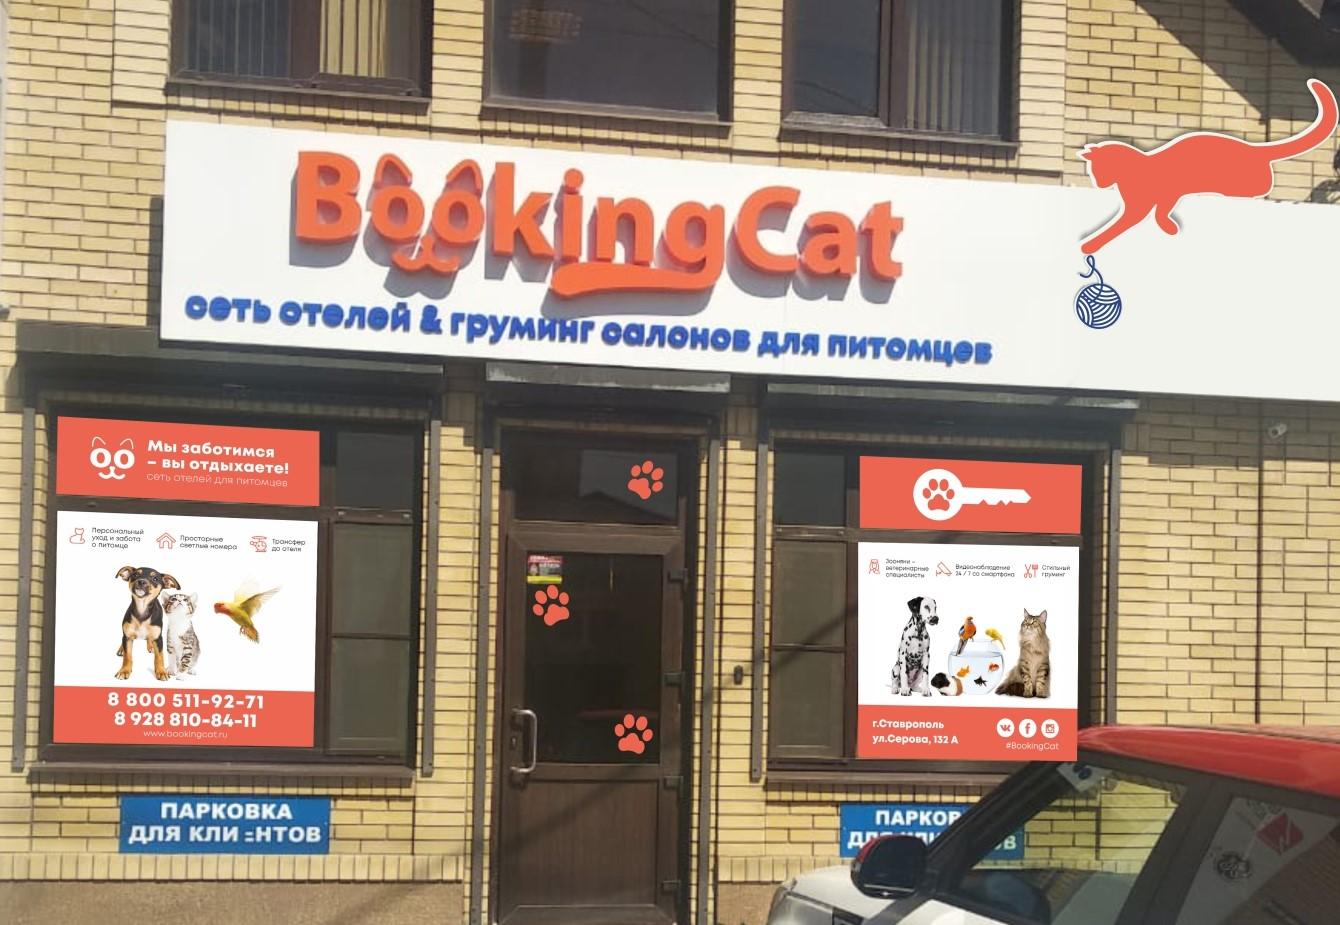 Bookingcat Ставрополь на Серова